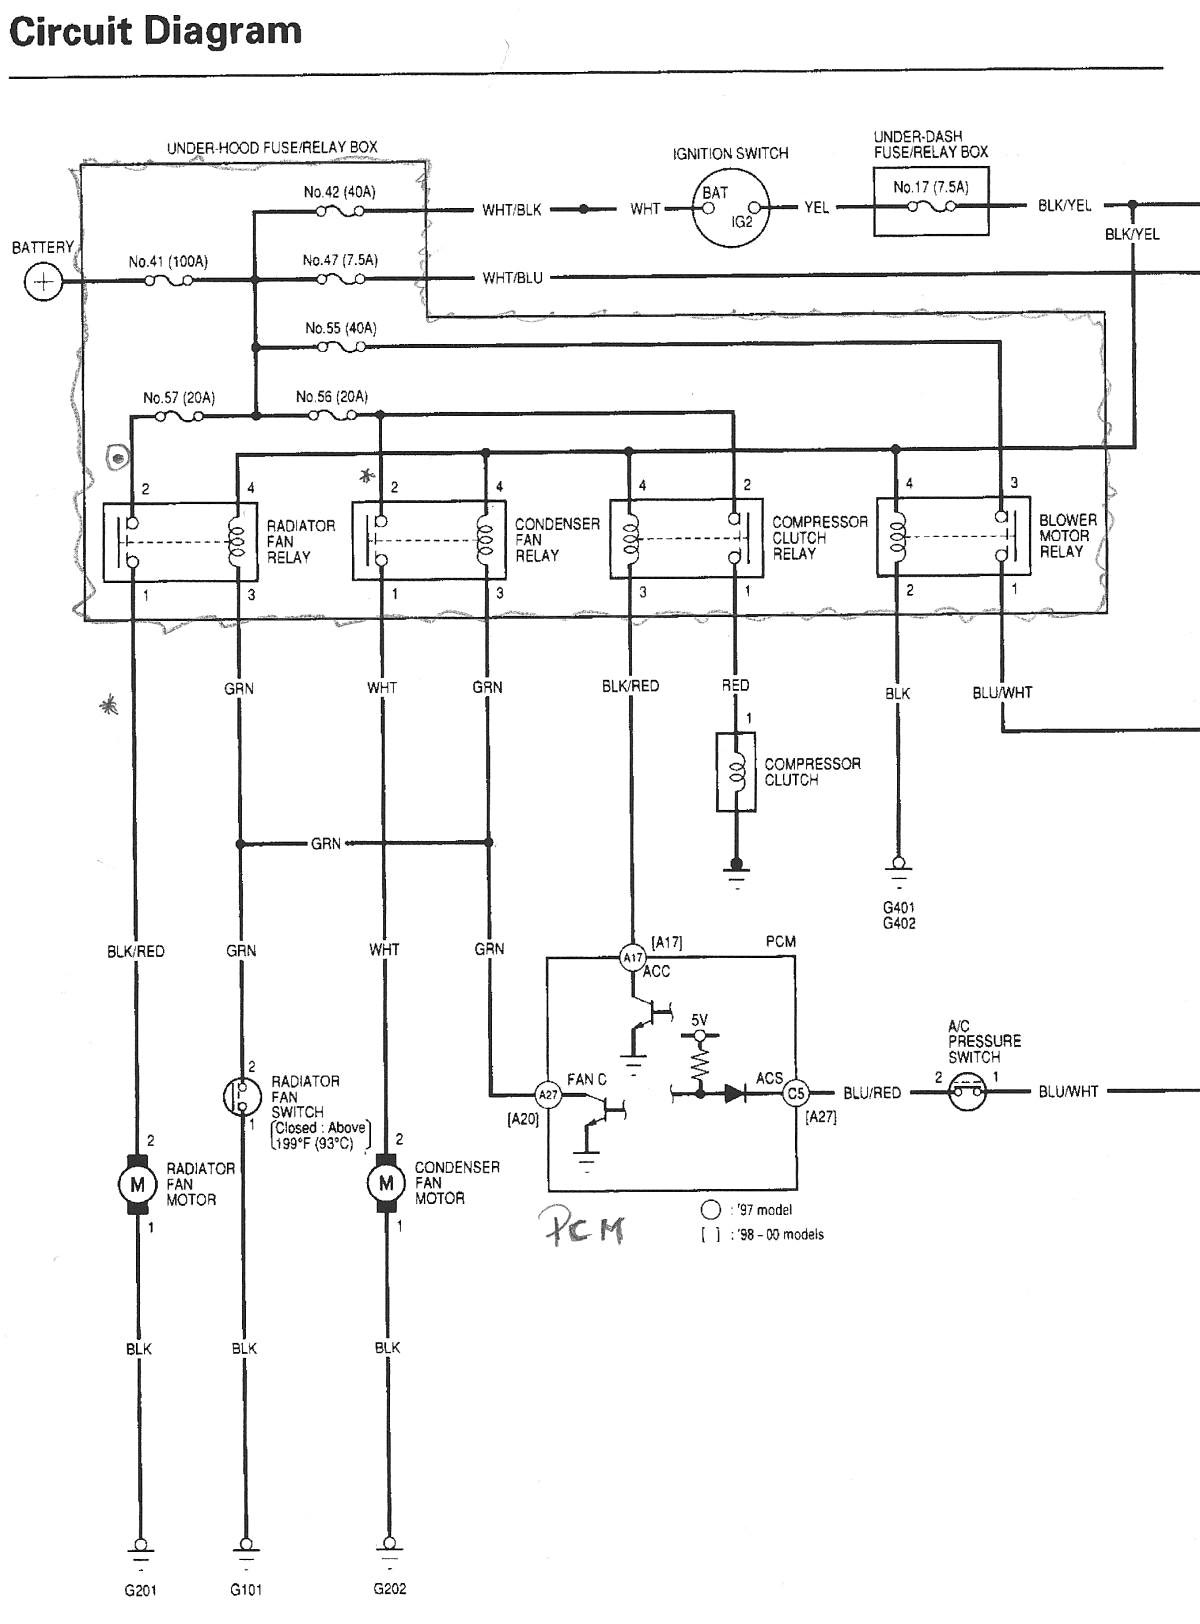 99 Honda Accord Engine Diagram - Wiring Diagram Networks | Wiring Diagram For 1999 Honda Accord |  | Wiring Diagram Networks - blogger